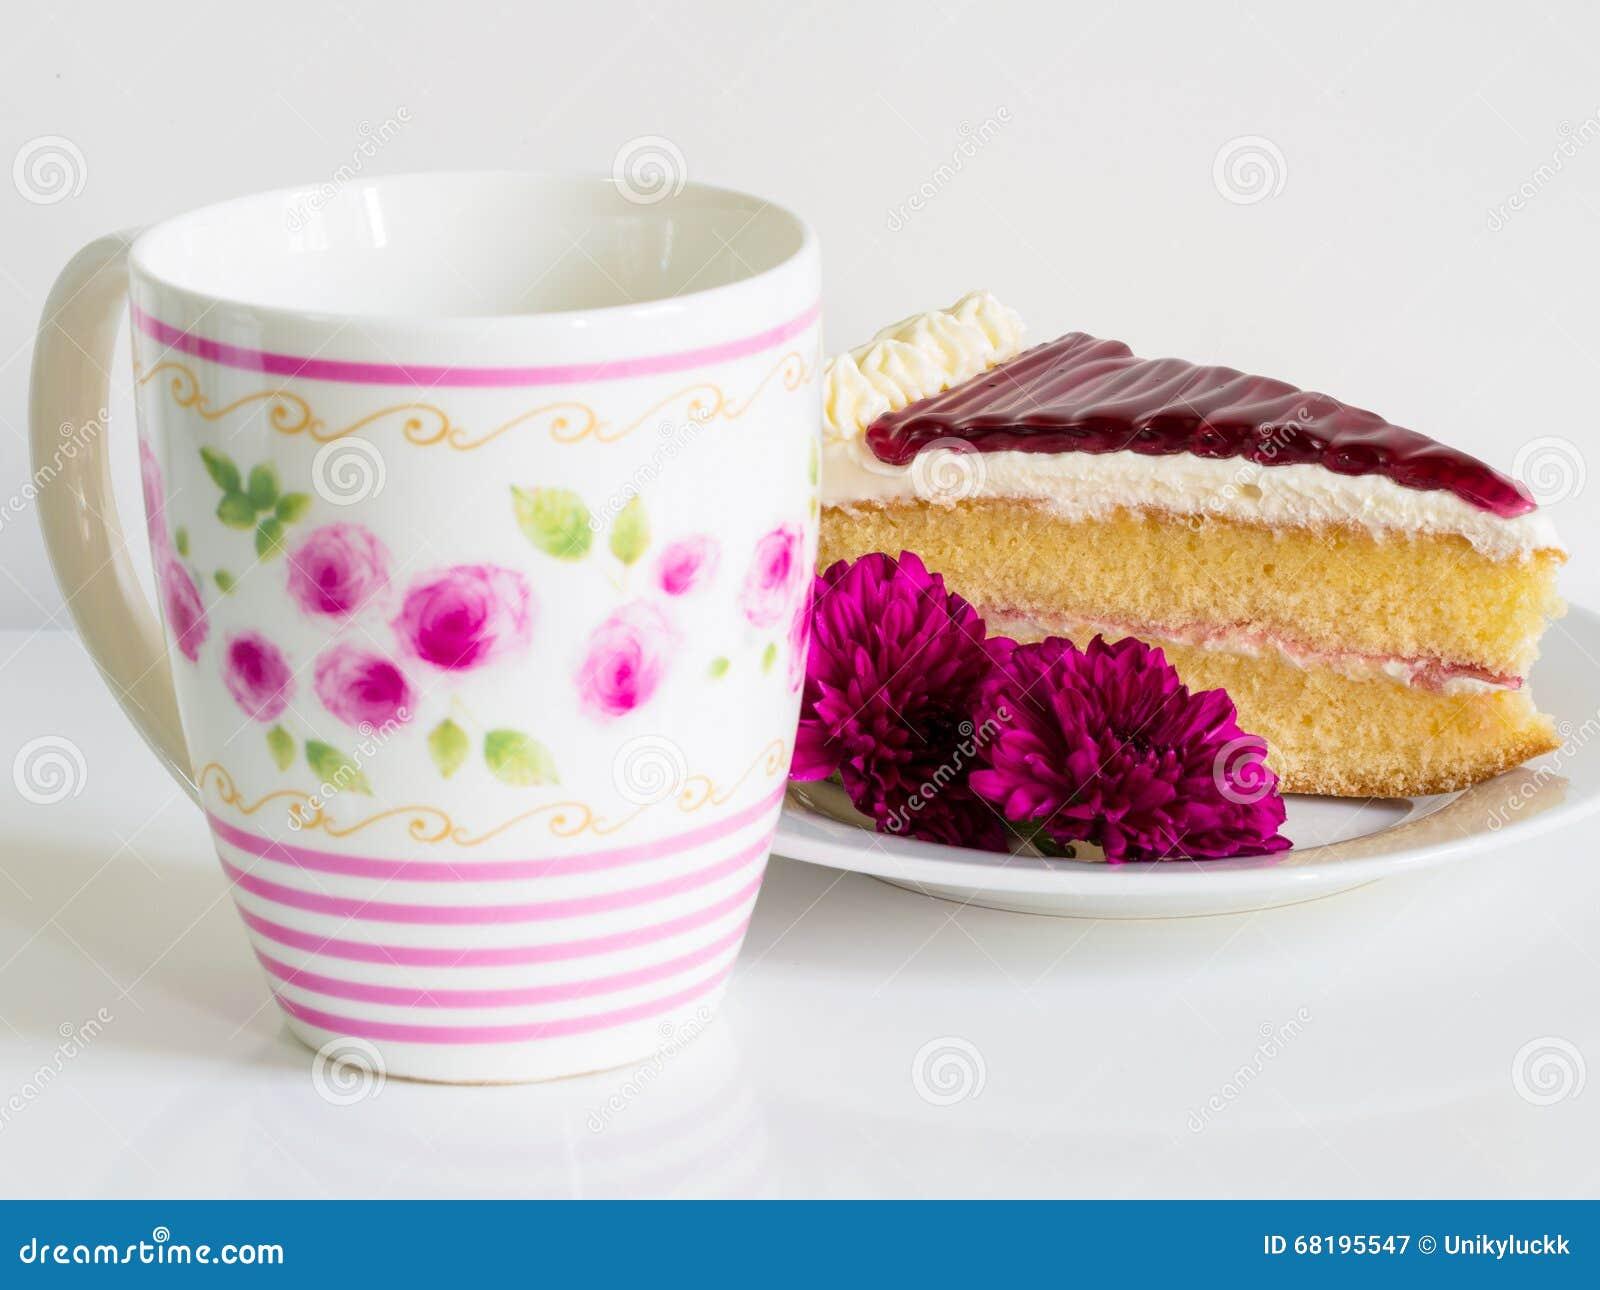 Chestnut Mug Cake